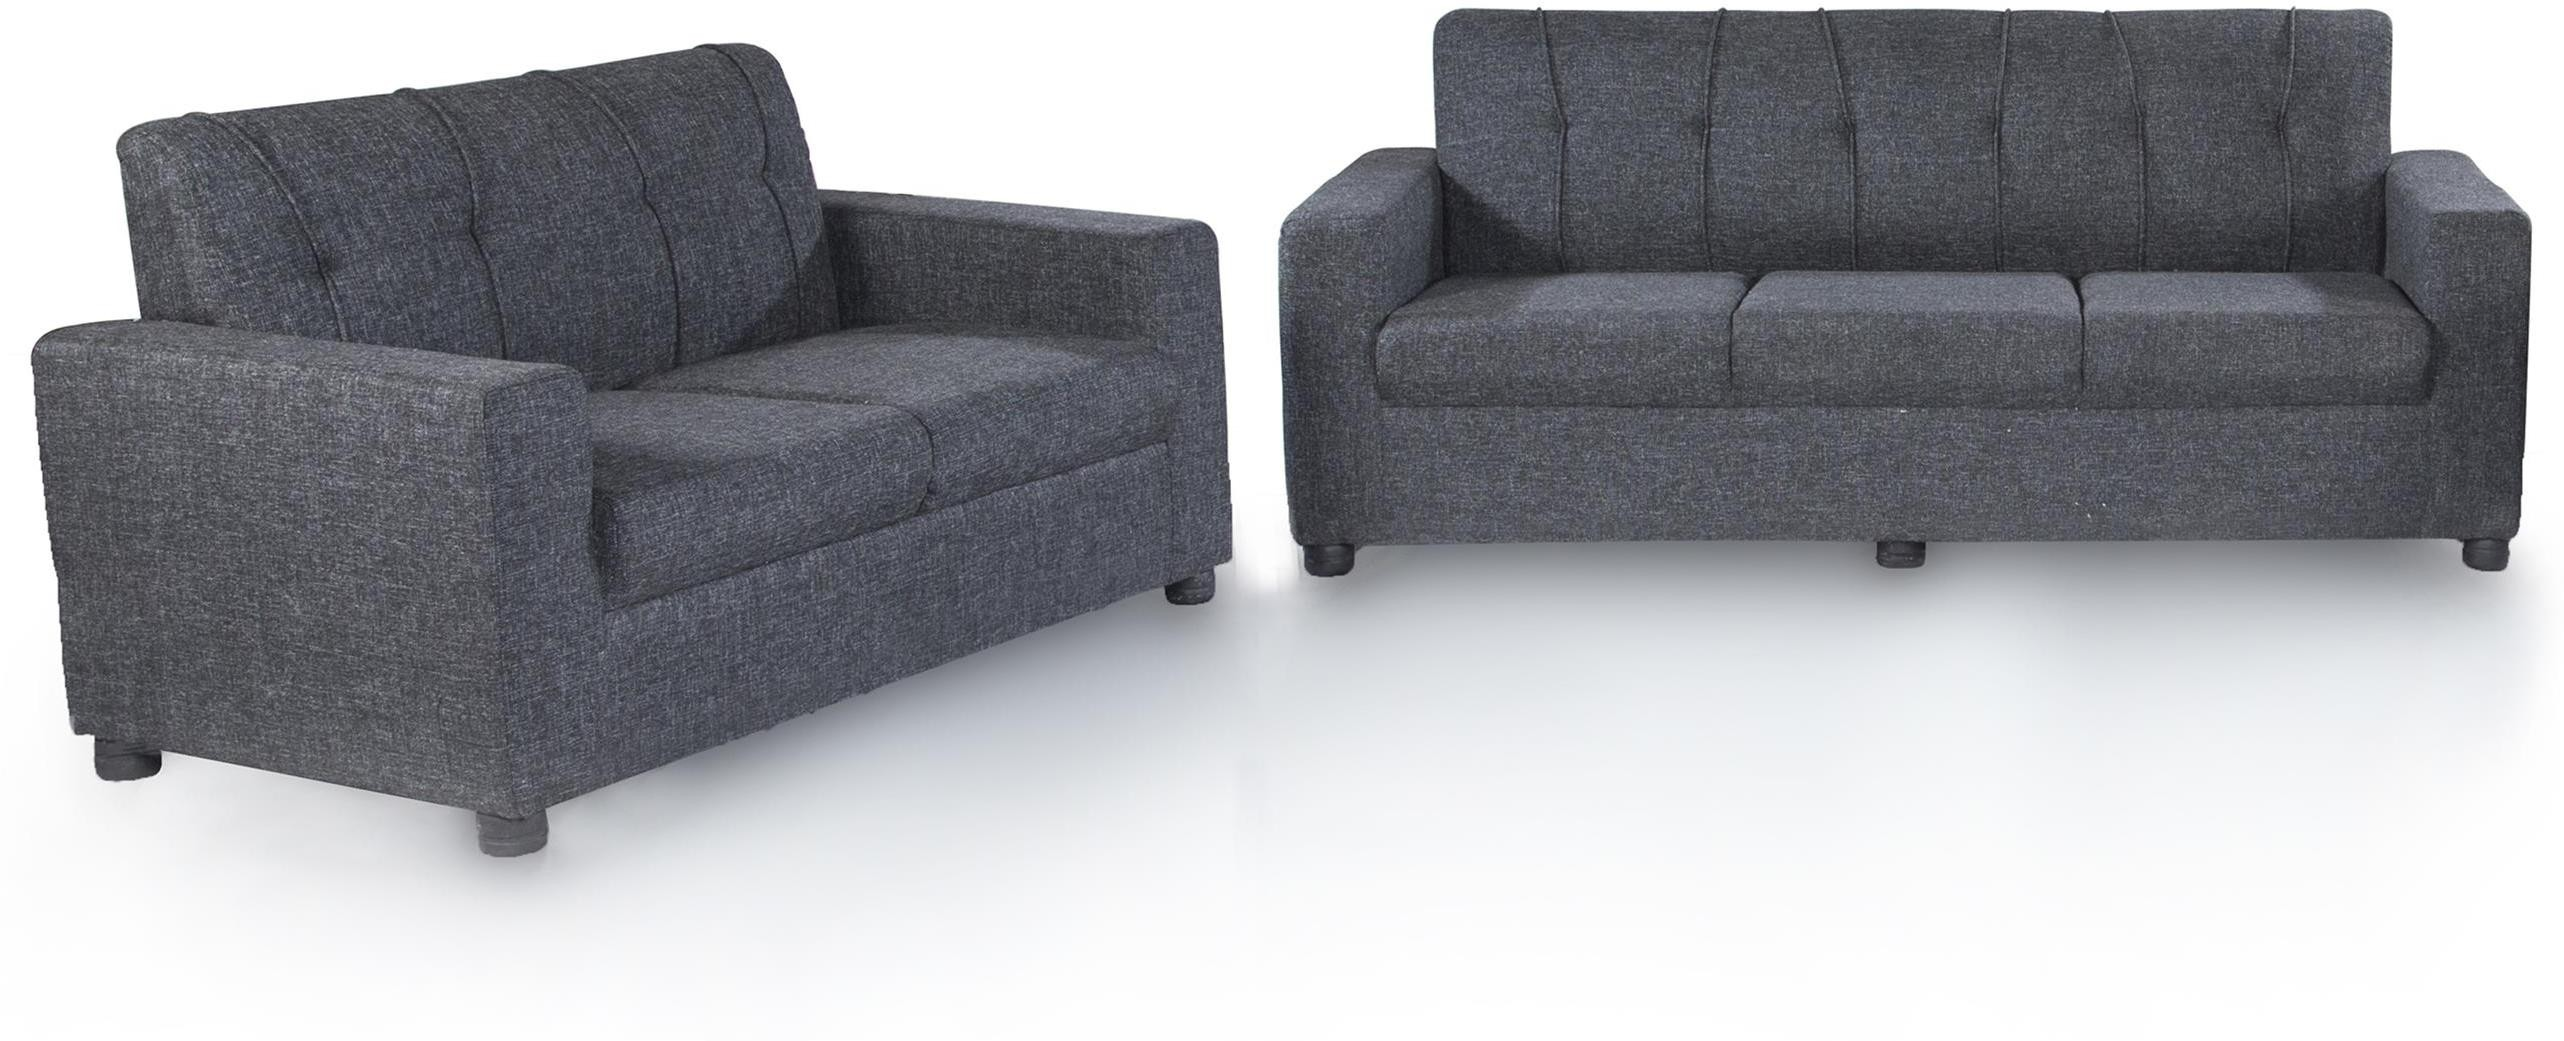 View Furnicity Fabric 3 + 2 Grey Sofa Set(Configuration - L-shaped) Furniture (Furnicity)